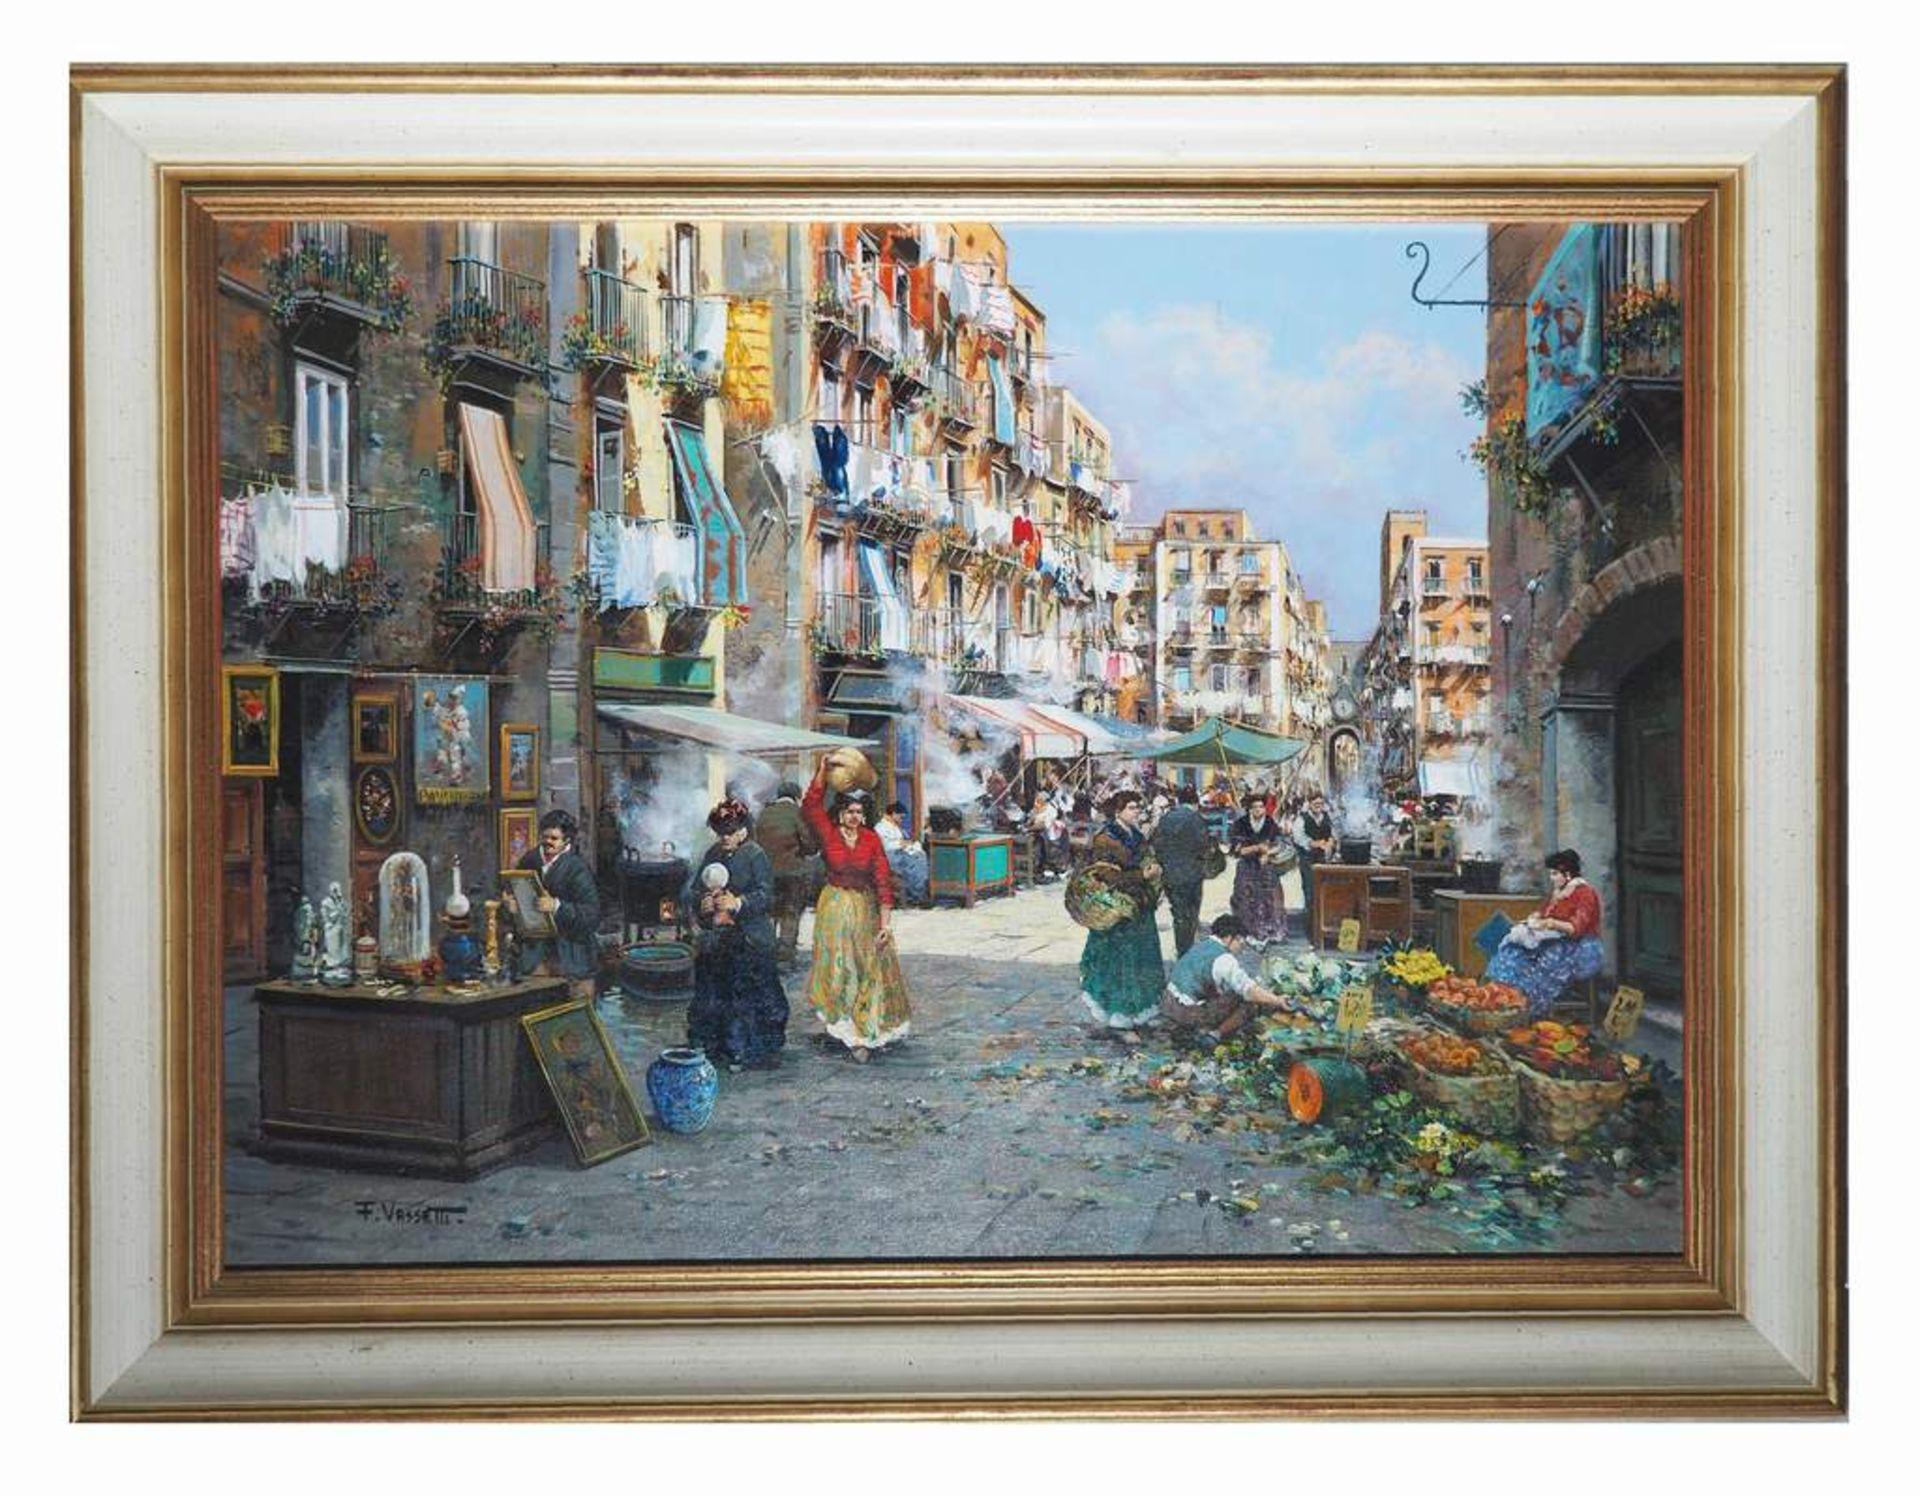 VASSETTI, Francesco. 1936 Neapel/Italien. Farbenfrohe Darstellung des Marklebens in Neapel. Öl auf - Bild 3 aus 7